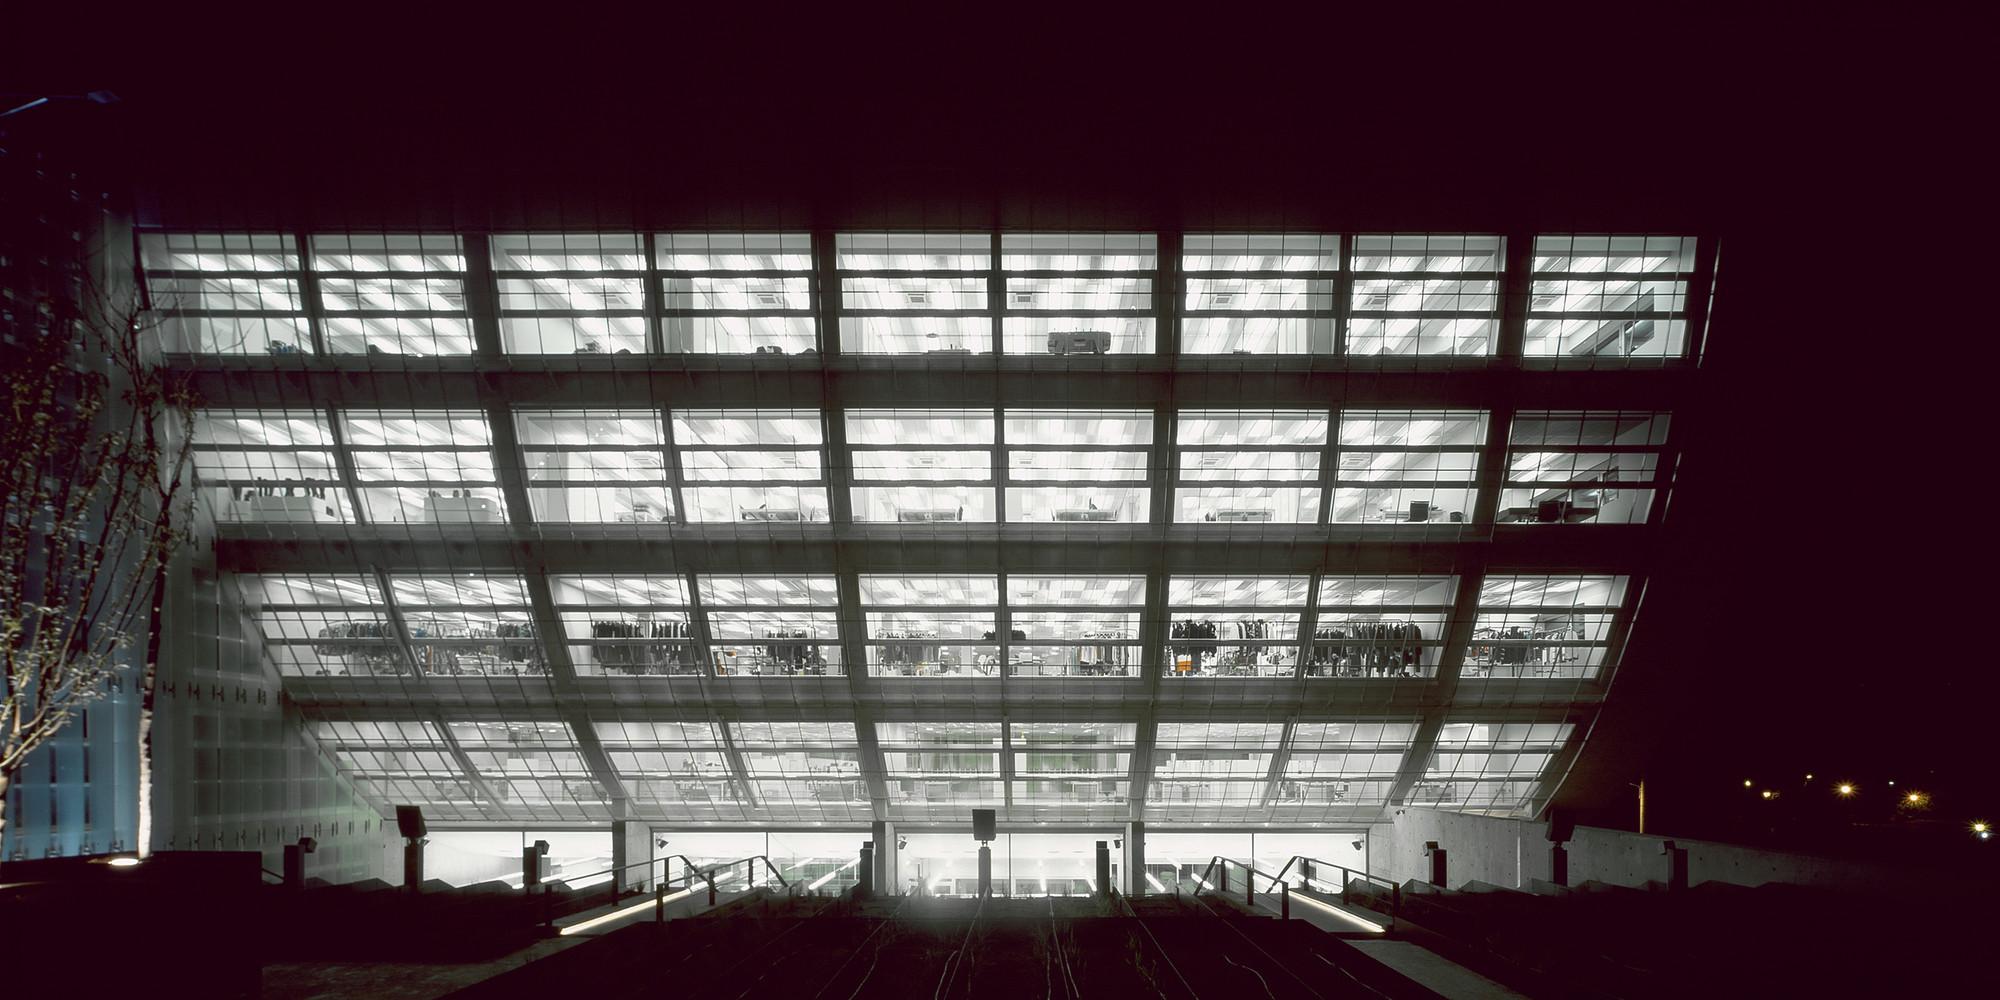 Shop & Trade / Kokkinou-Kourkoulas Architects